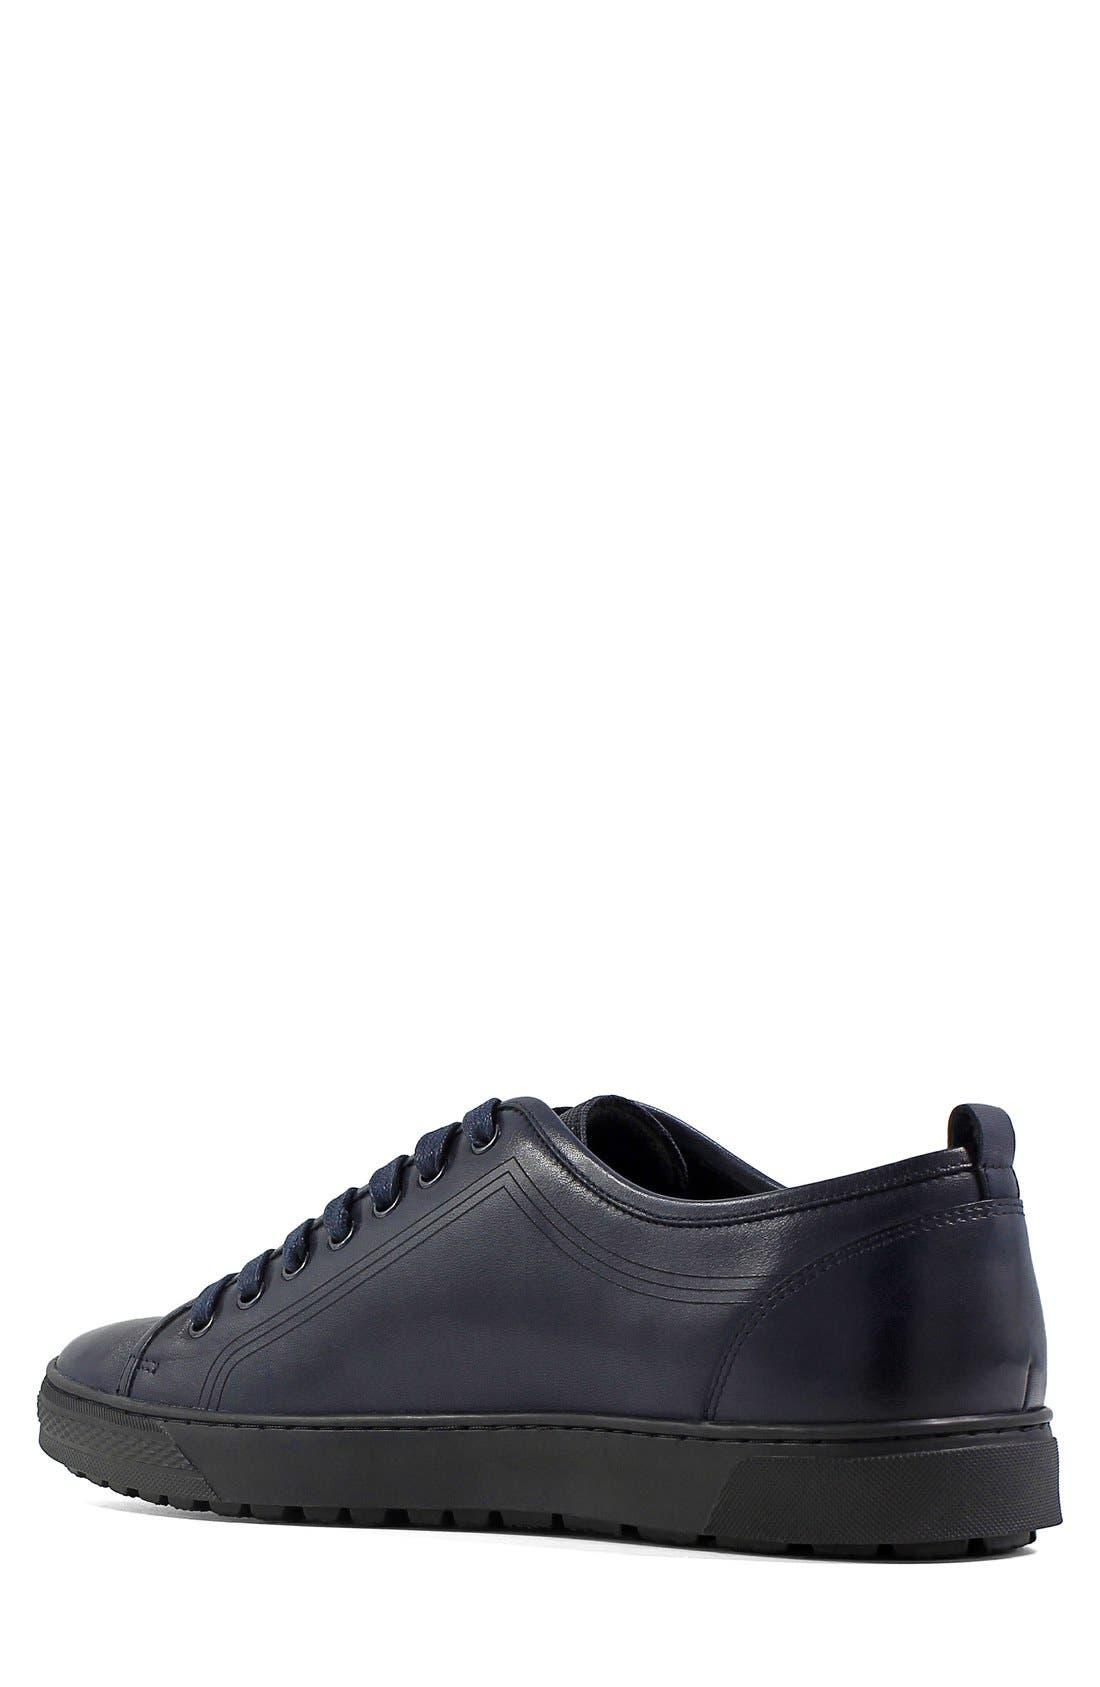 Forward Lo Sneaker,                             Alternate thumbnail 14, color,